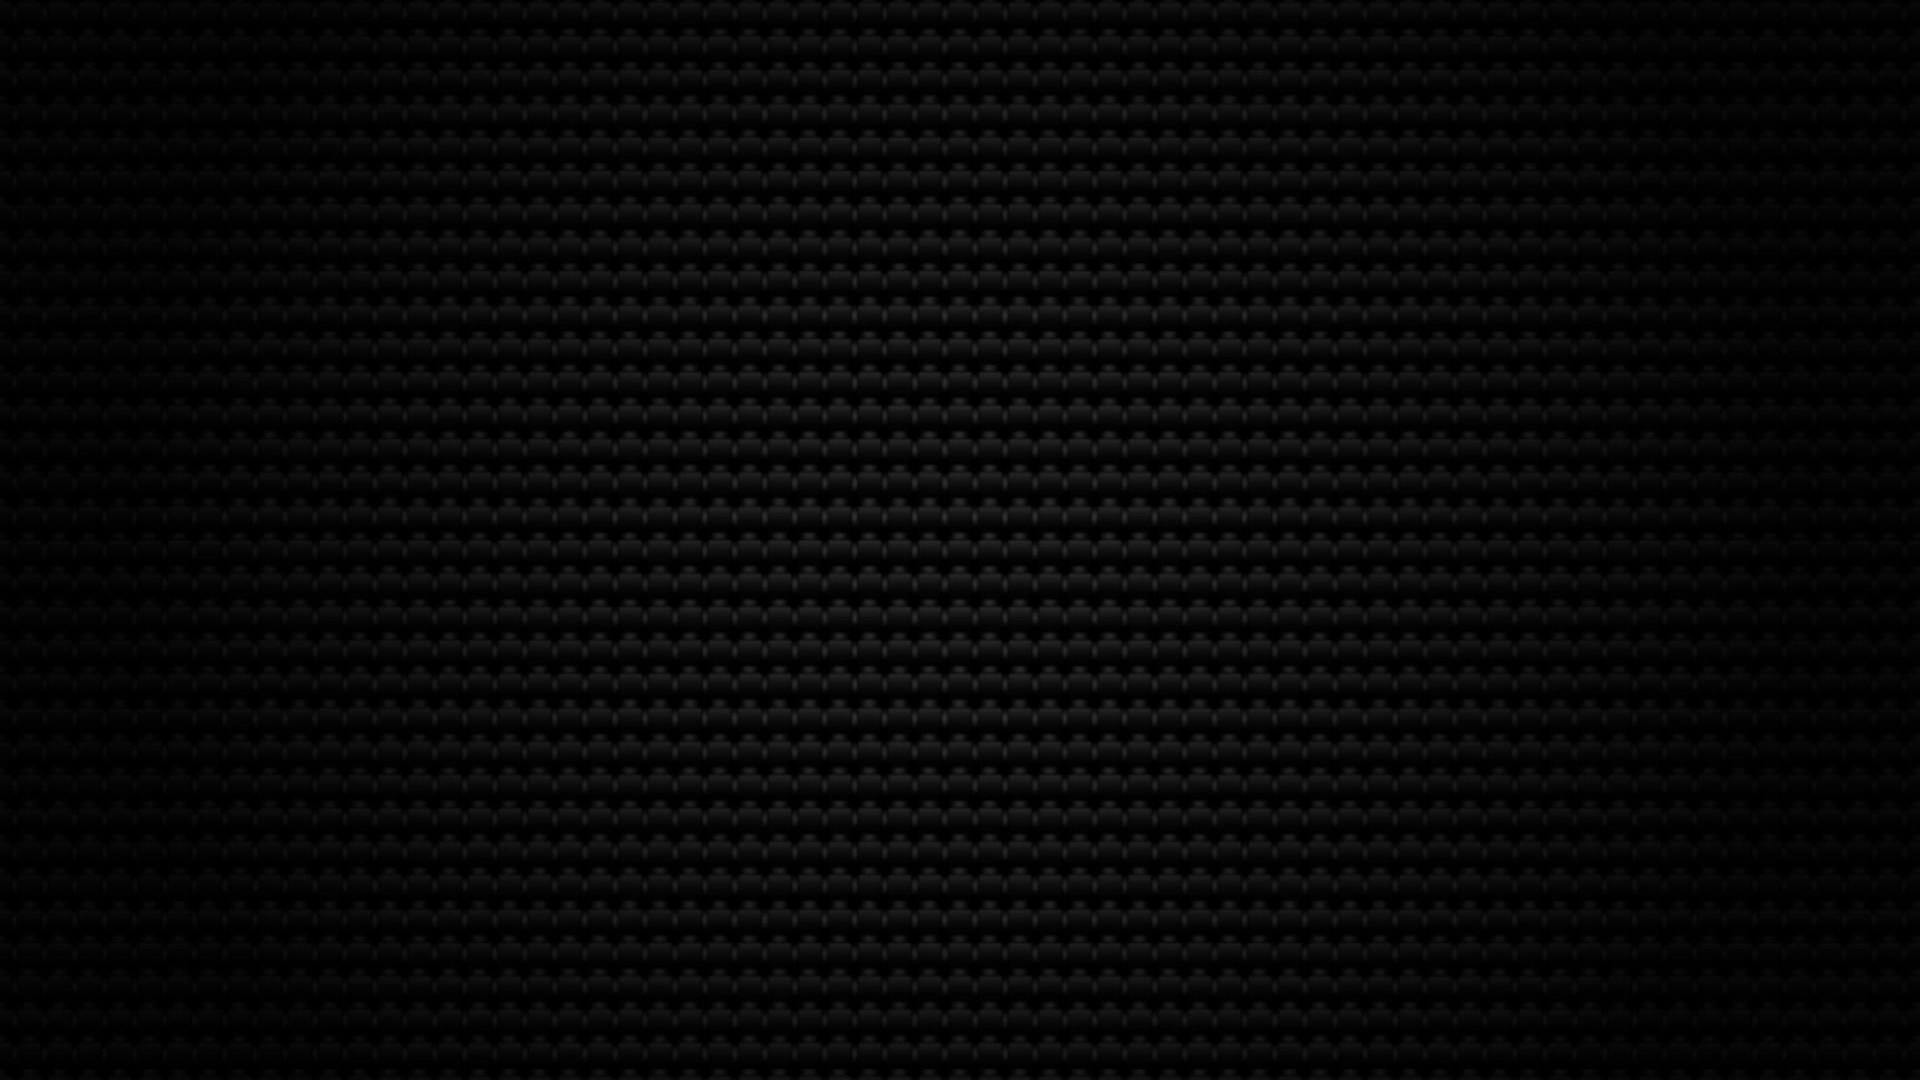 Full Black Carbon Fiber Wallpaper [1920 × 1080]